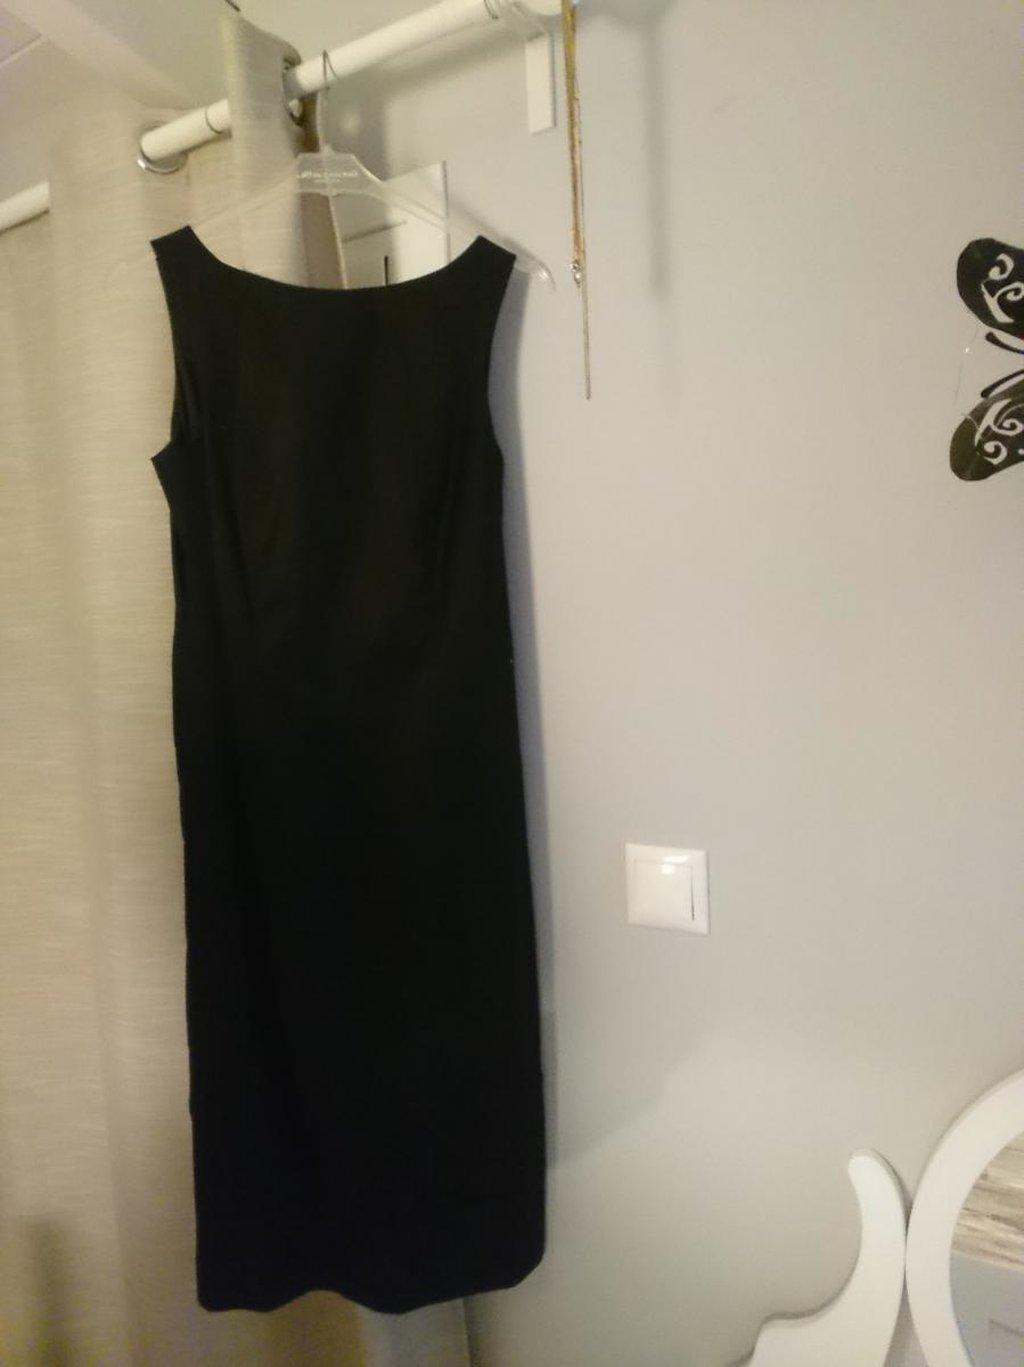 Zara pencil dress 38 size αφορετο